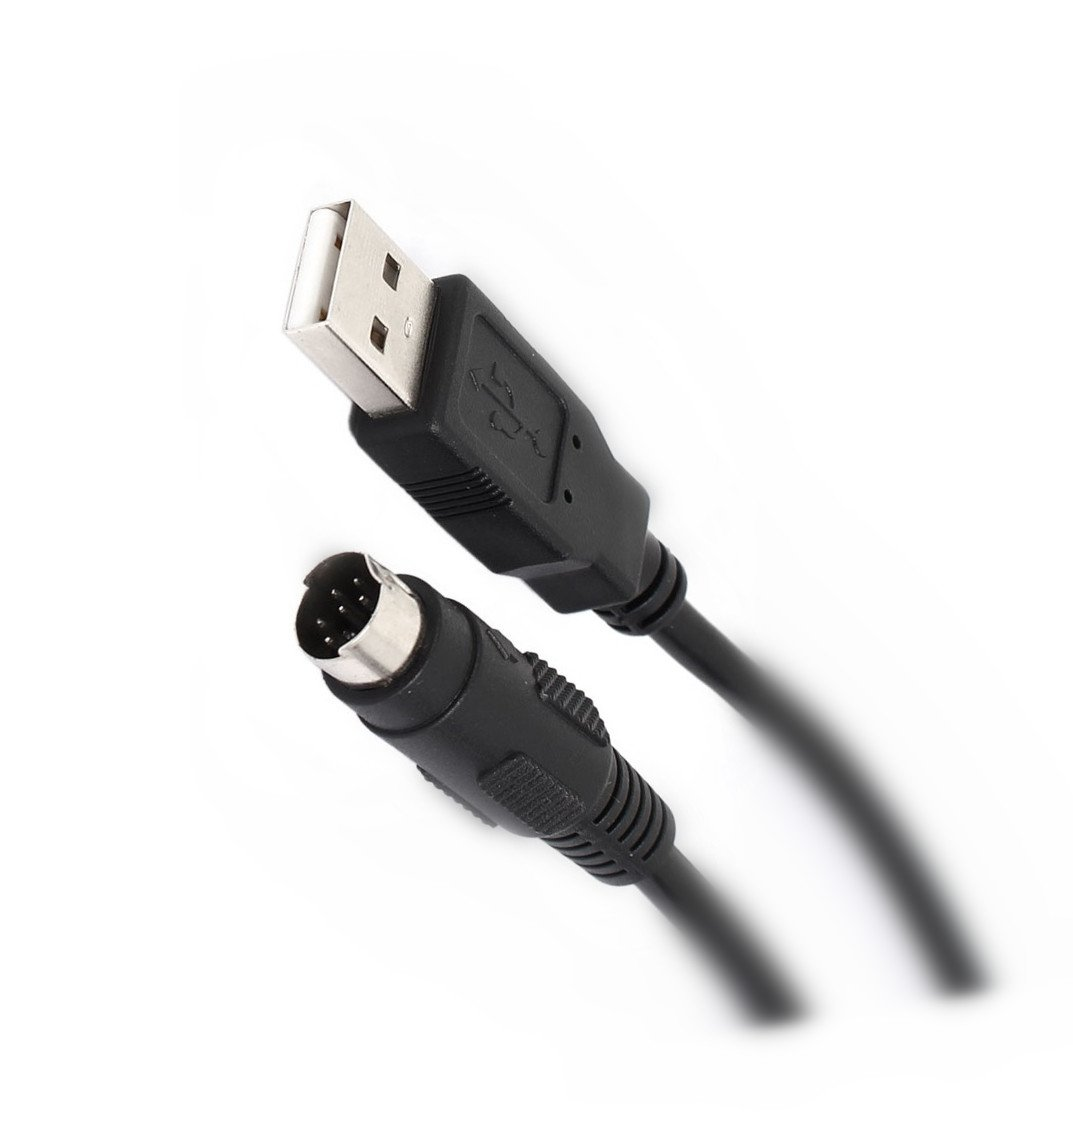 EZSync FTDI USB to RS232 Program Cable for Kenwood Radio, PG-5G, 8 pin Mini-DIN, EZSync702